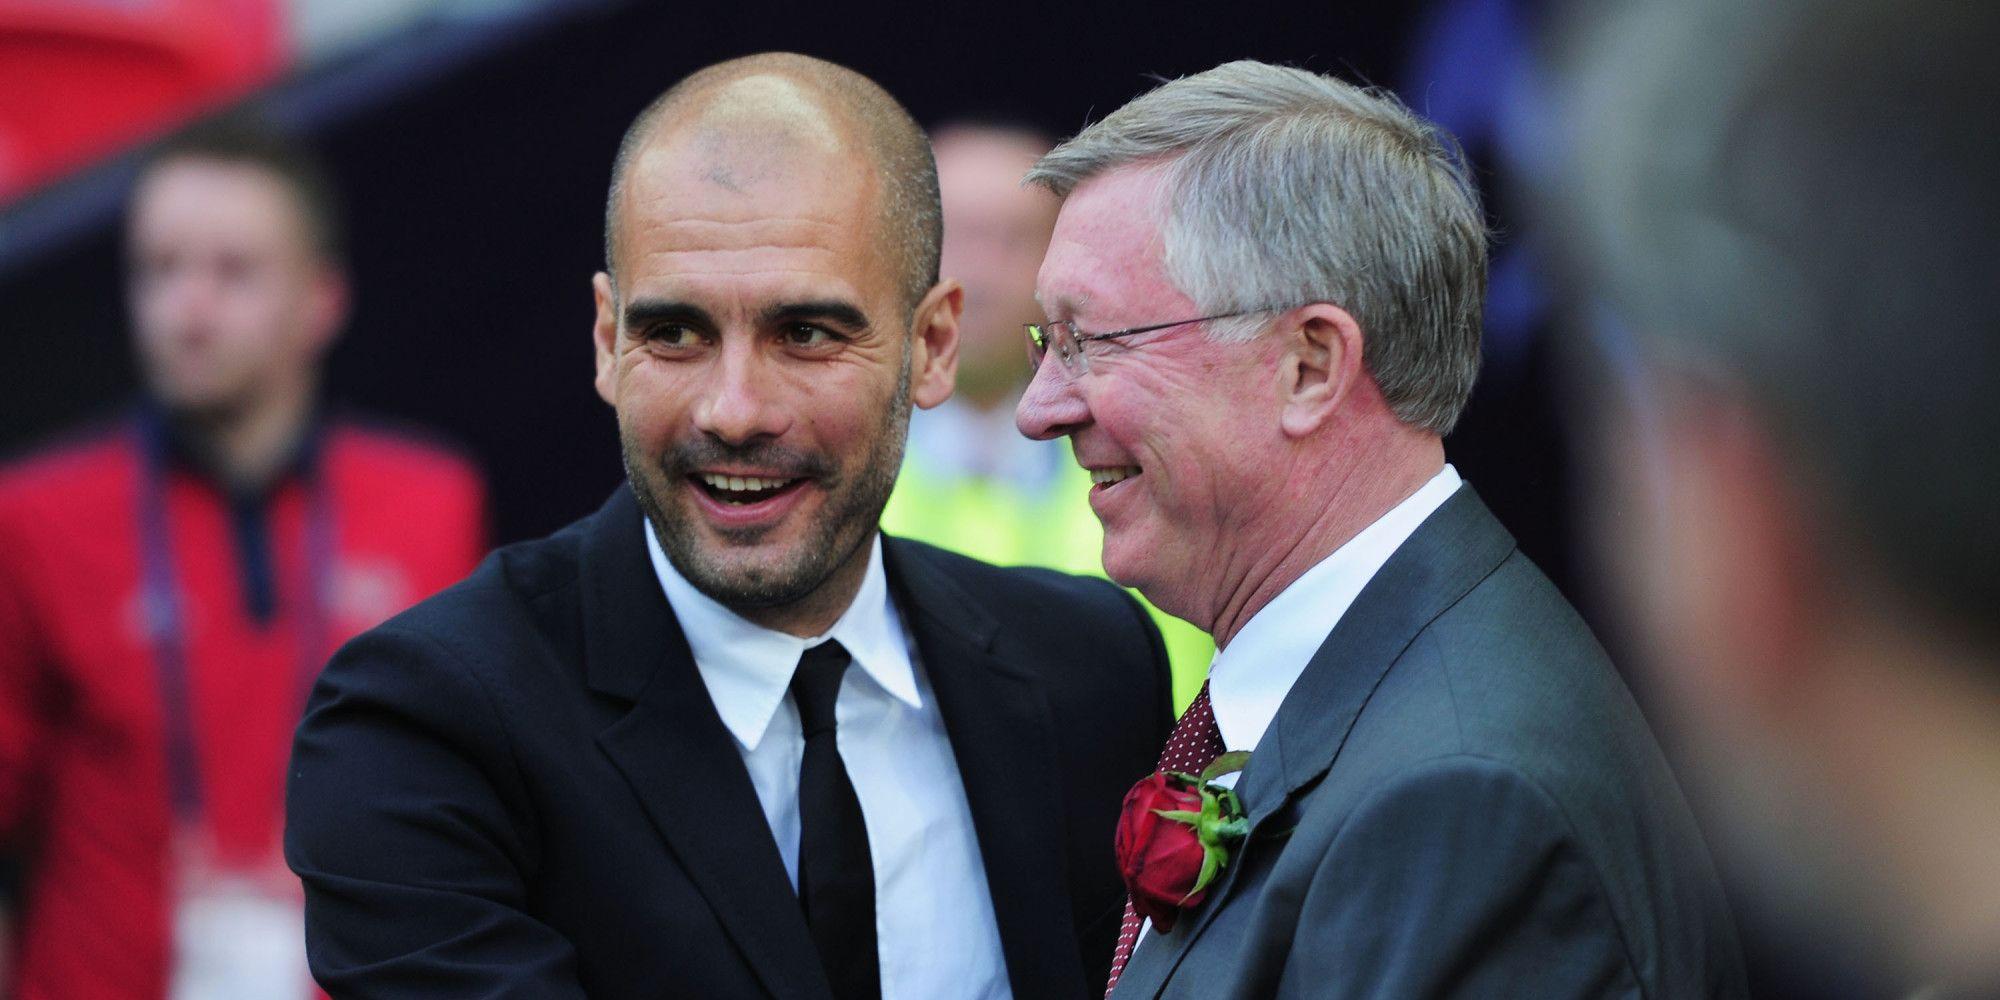 Sir Alex Ferguson bigger influence than Pep Guardiola, says Ole Gunnar Solskjaer - Bóng Đá